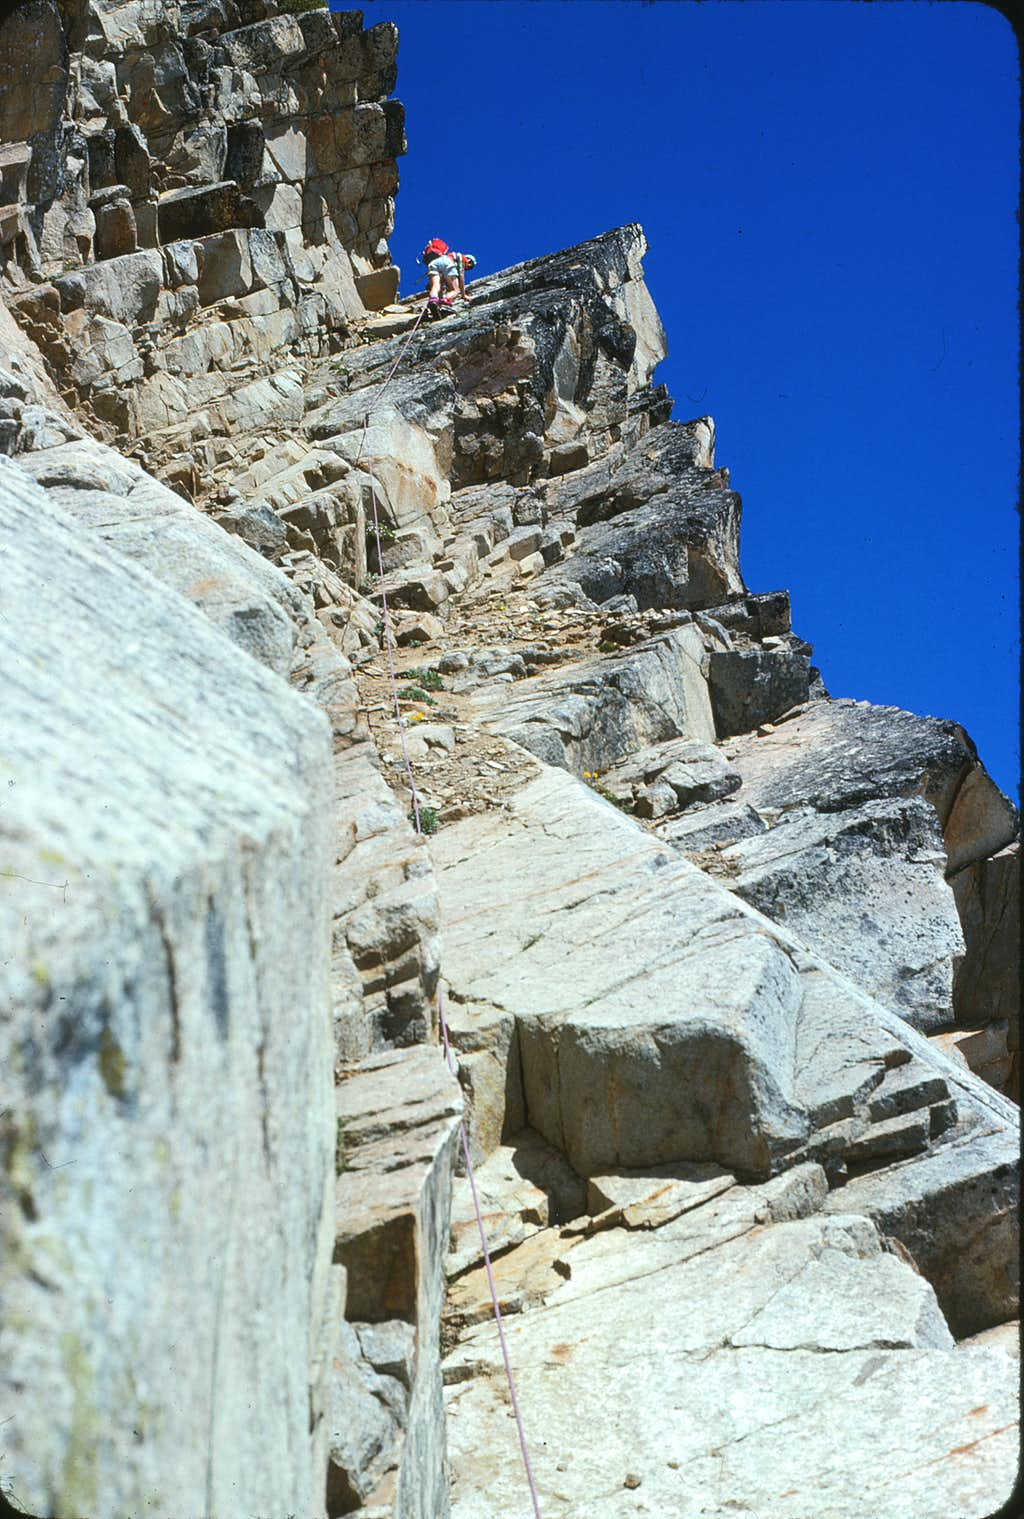 North Peak - tackling the East Face ramp